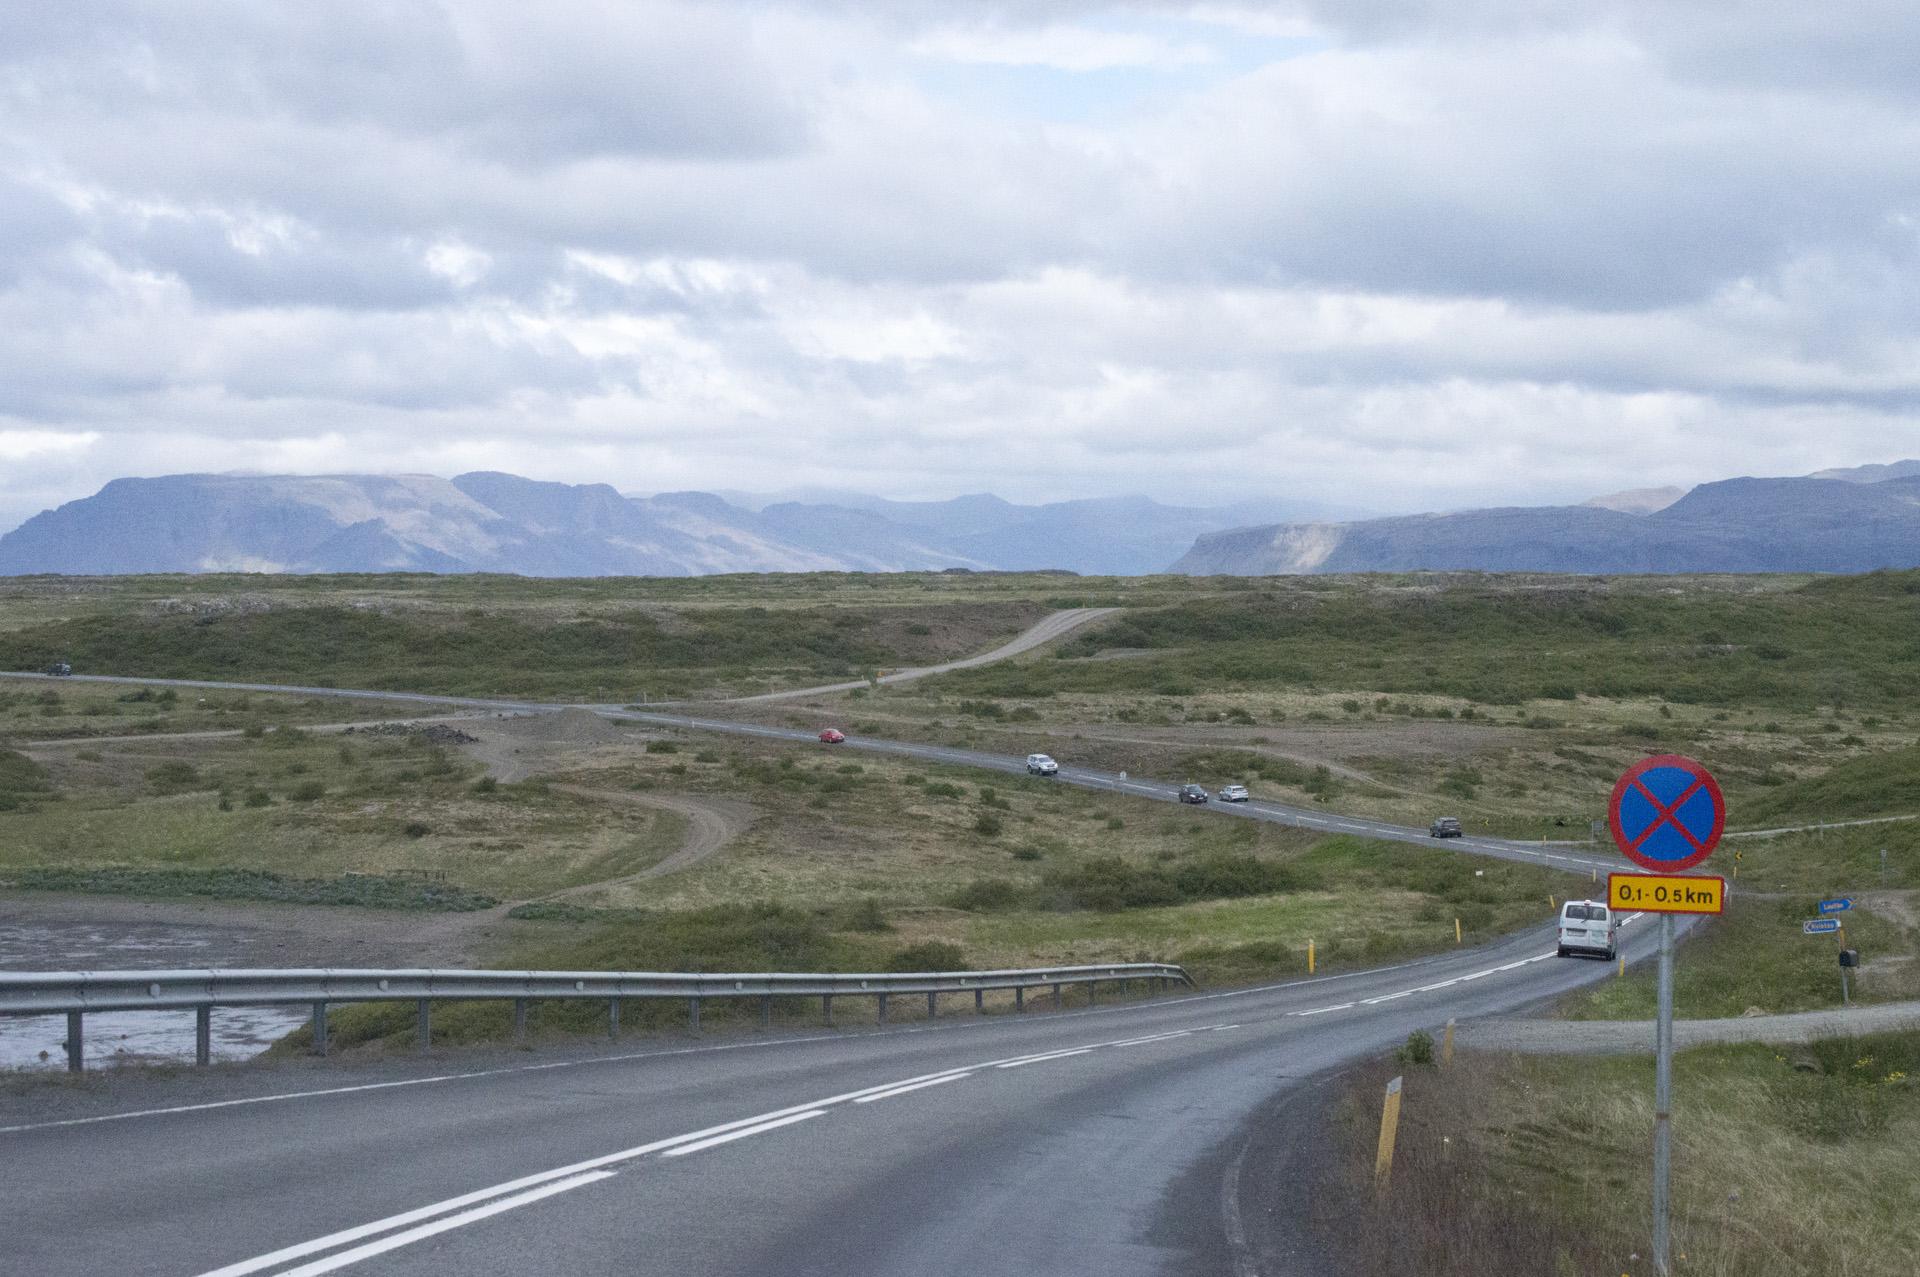 Rural road in Vesturland region, Iceland.